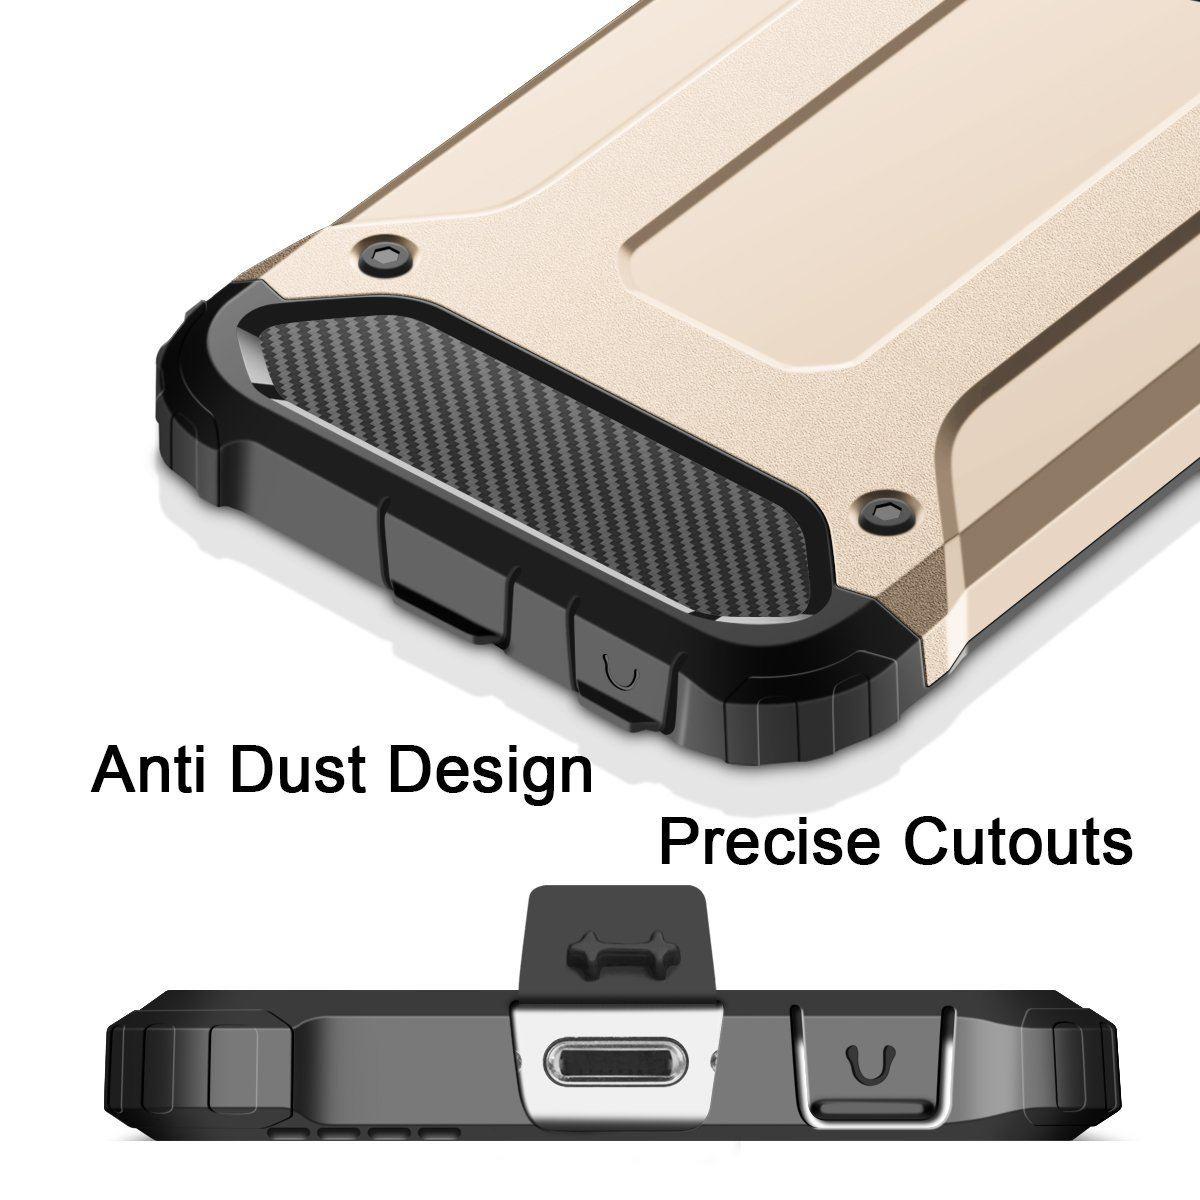 thumbnail 52 - For Apple iPhone 11 Pro Max XR Xs X 8 7 Plus 6 5 Se Case Cover Impact Heavy Duty